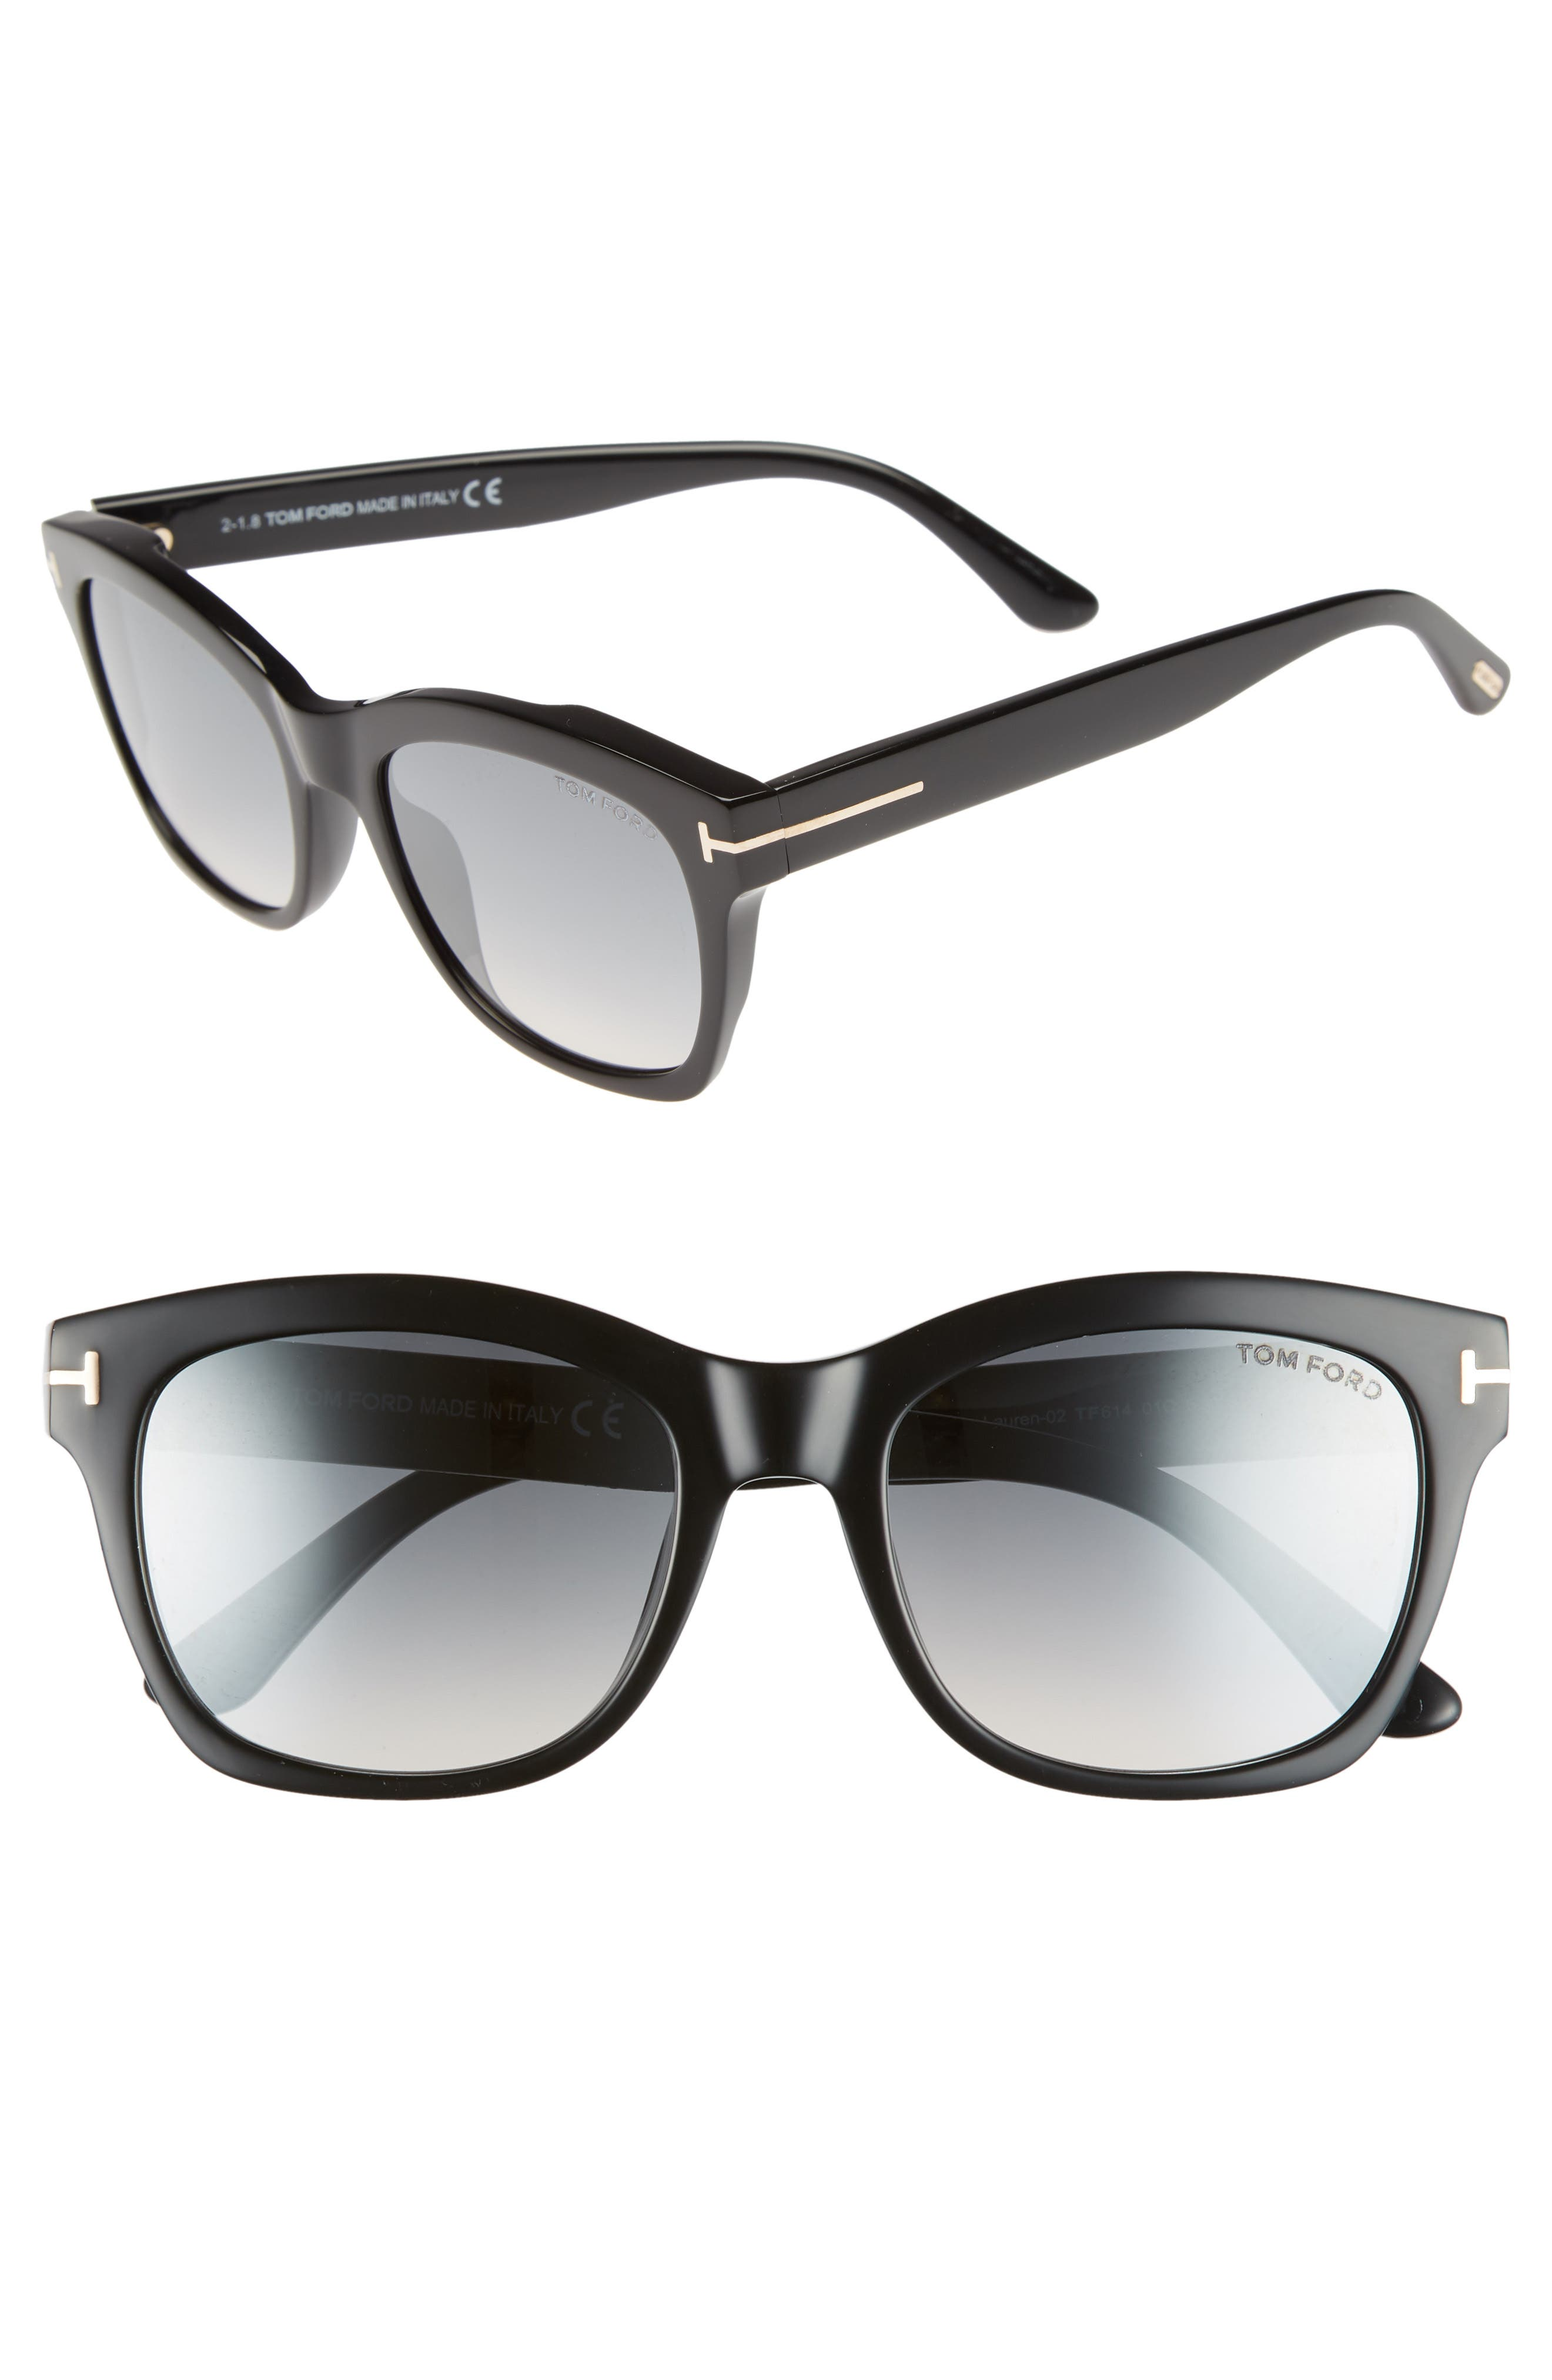 Lauren 52mm Sunglasses,                             Main thumbnail 1, color,                             SHINY BLACK/ SMOKE MIRROR